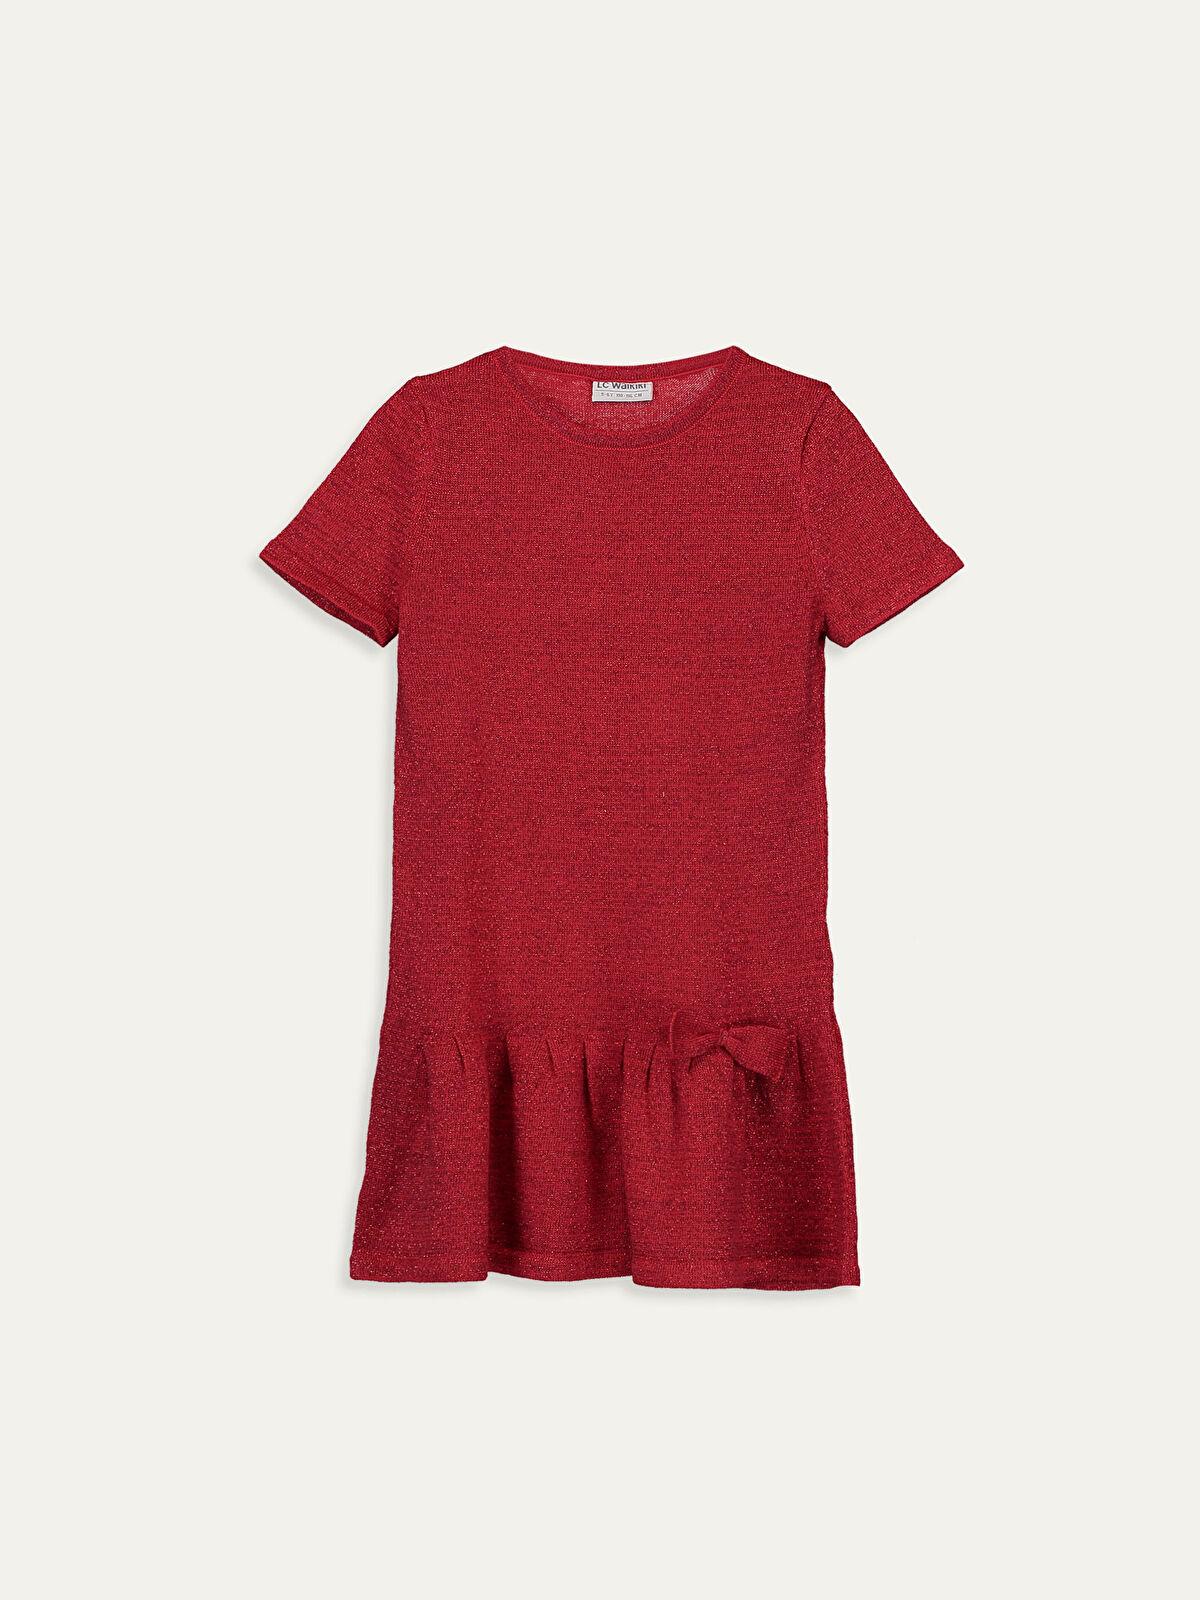 Kız Çocuk Fiyonk Detaylı Triko Elbise - LC WAIKIKI